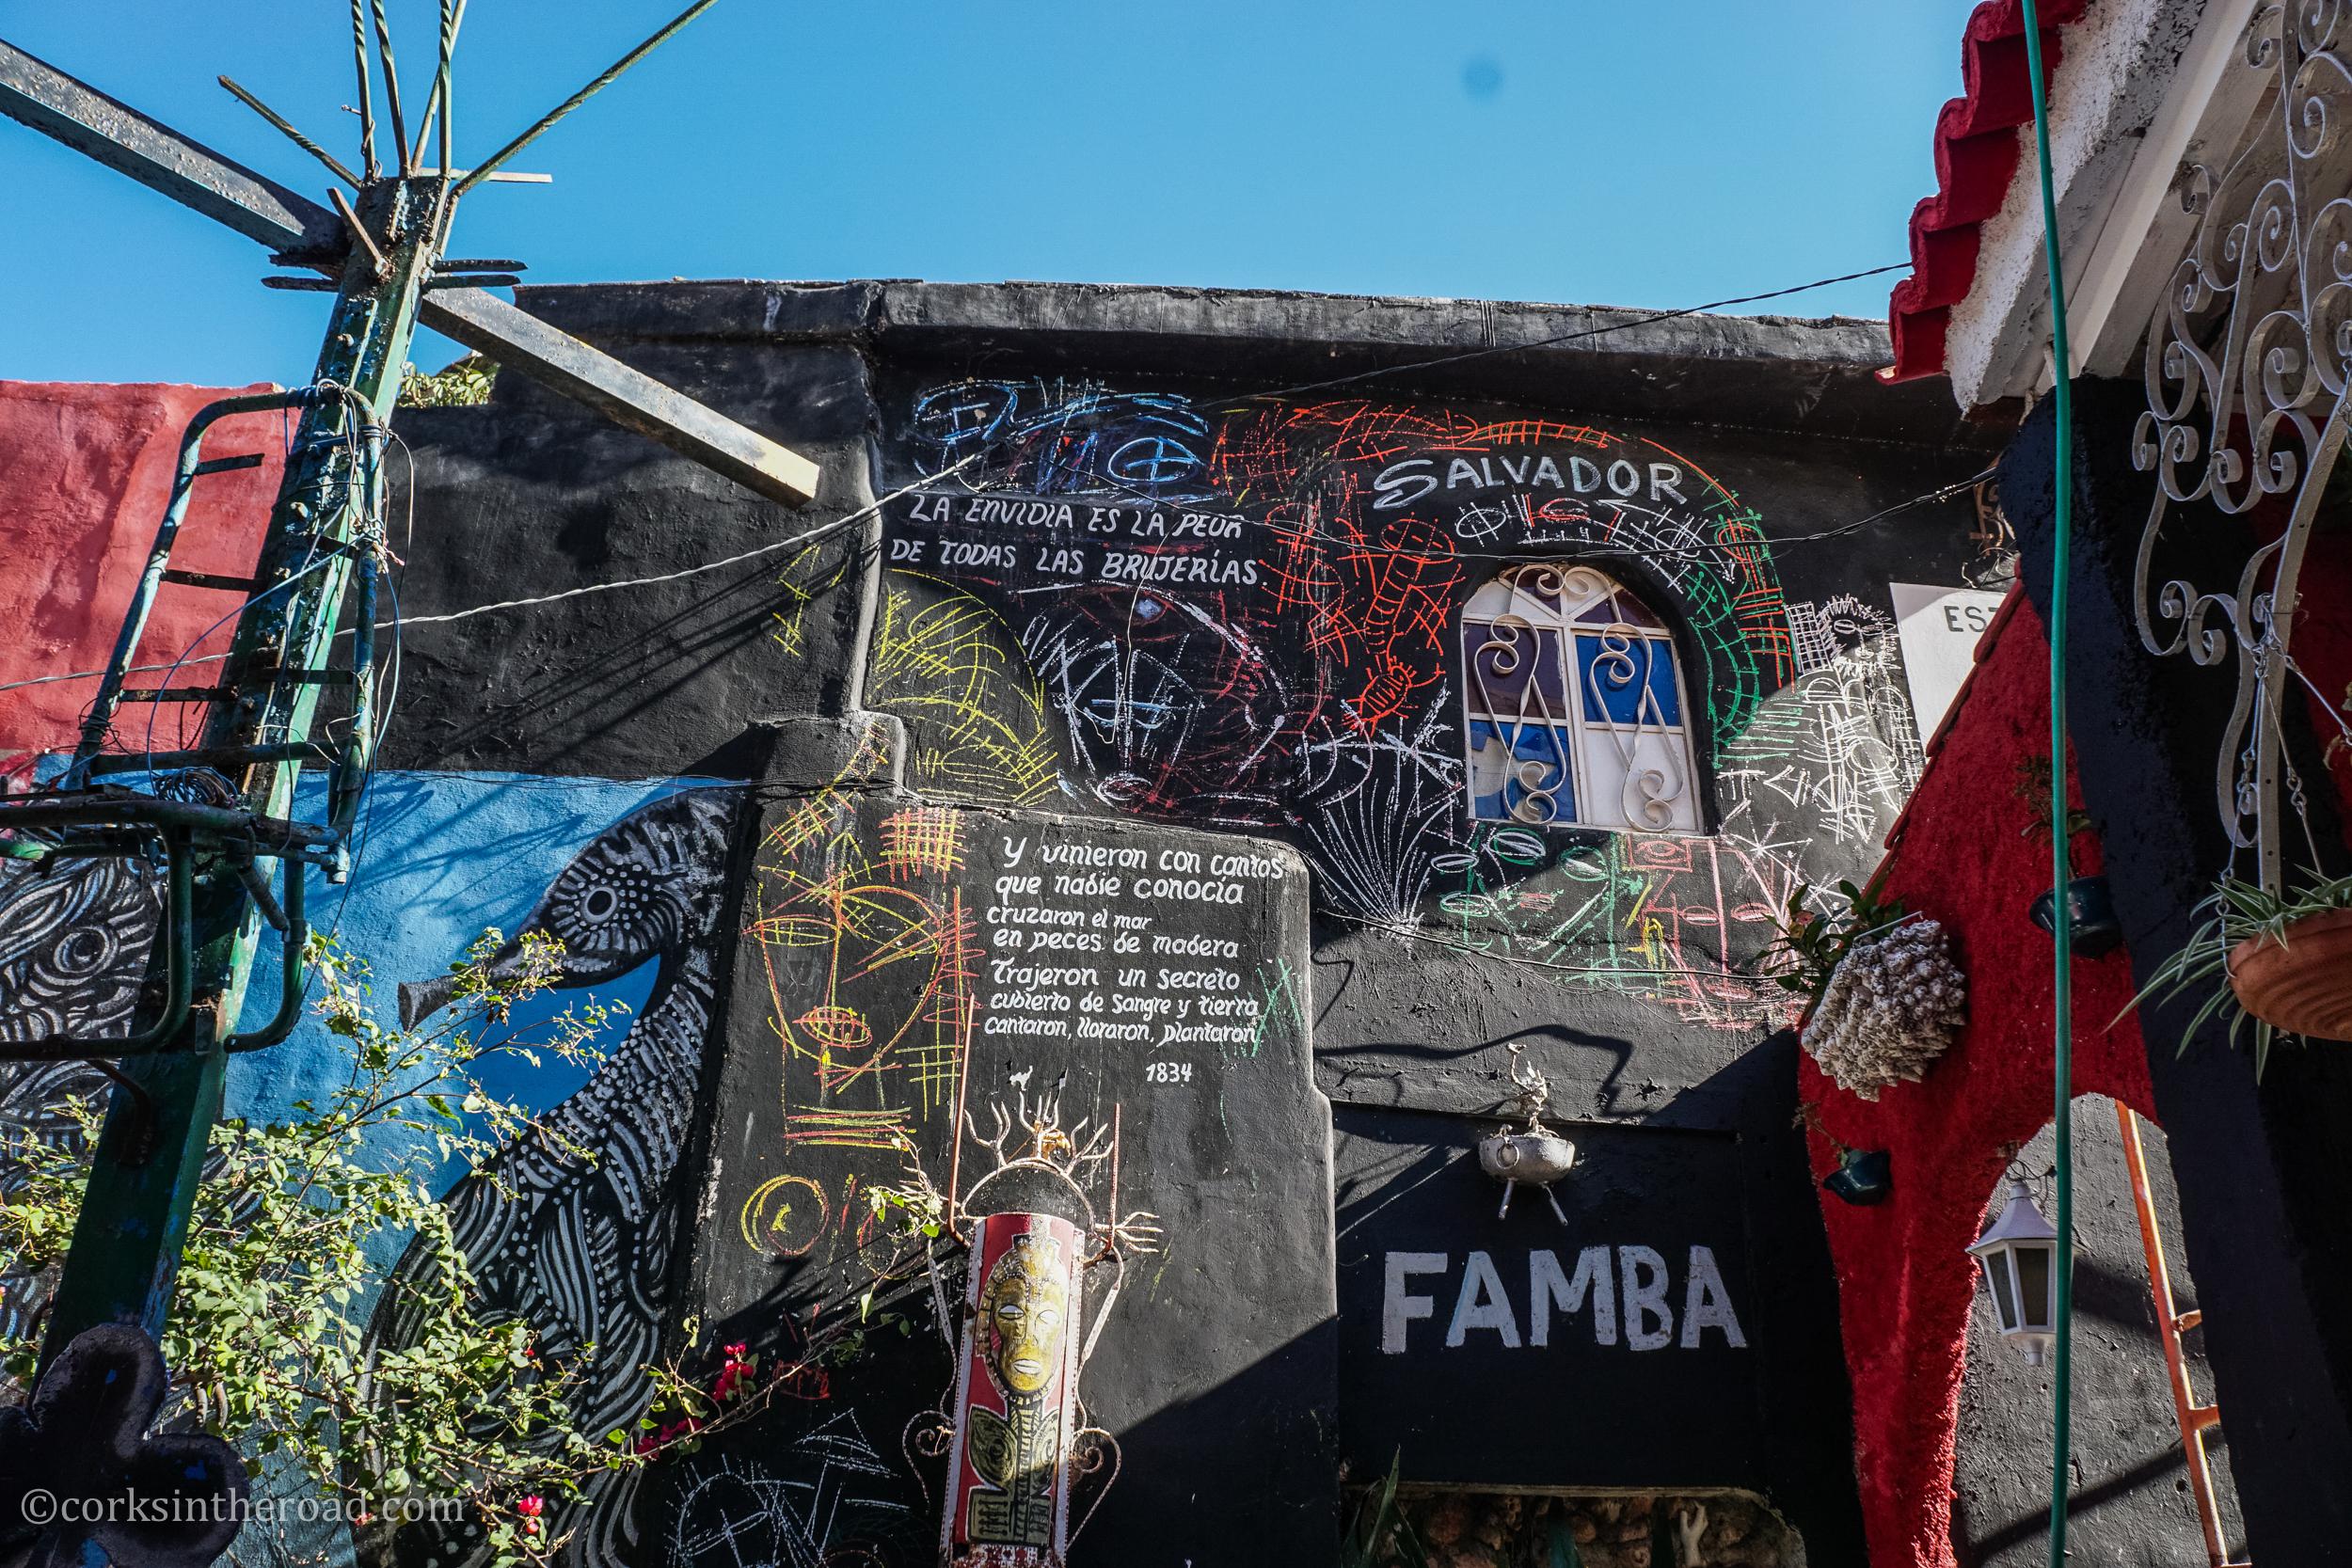 Corksintheroad, Cuba, Hamel, Street Art-2.jpg